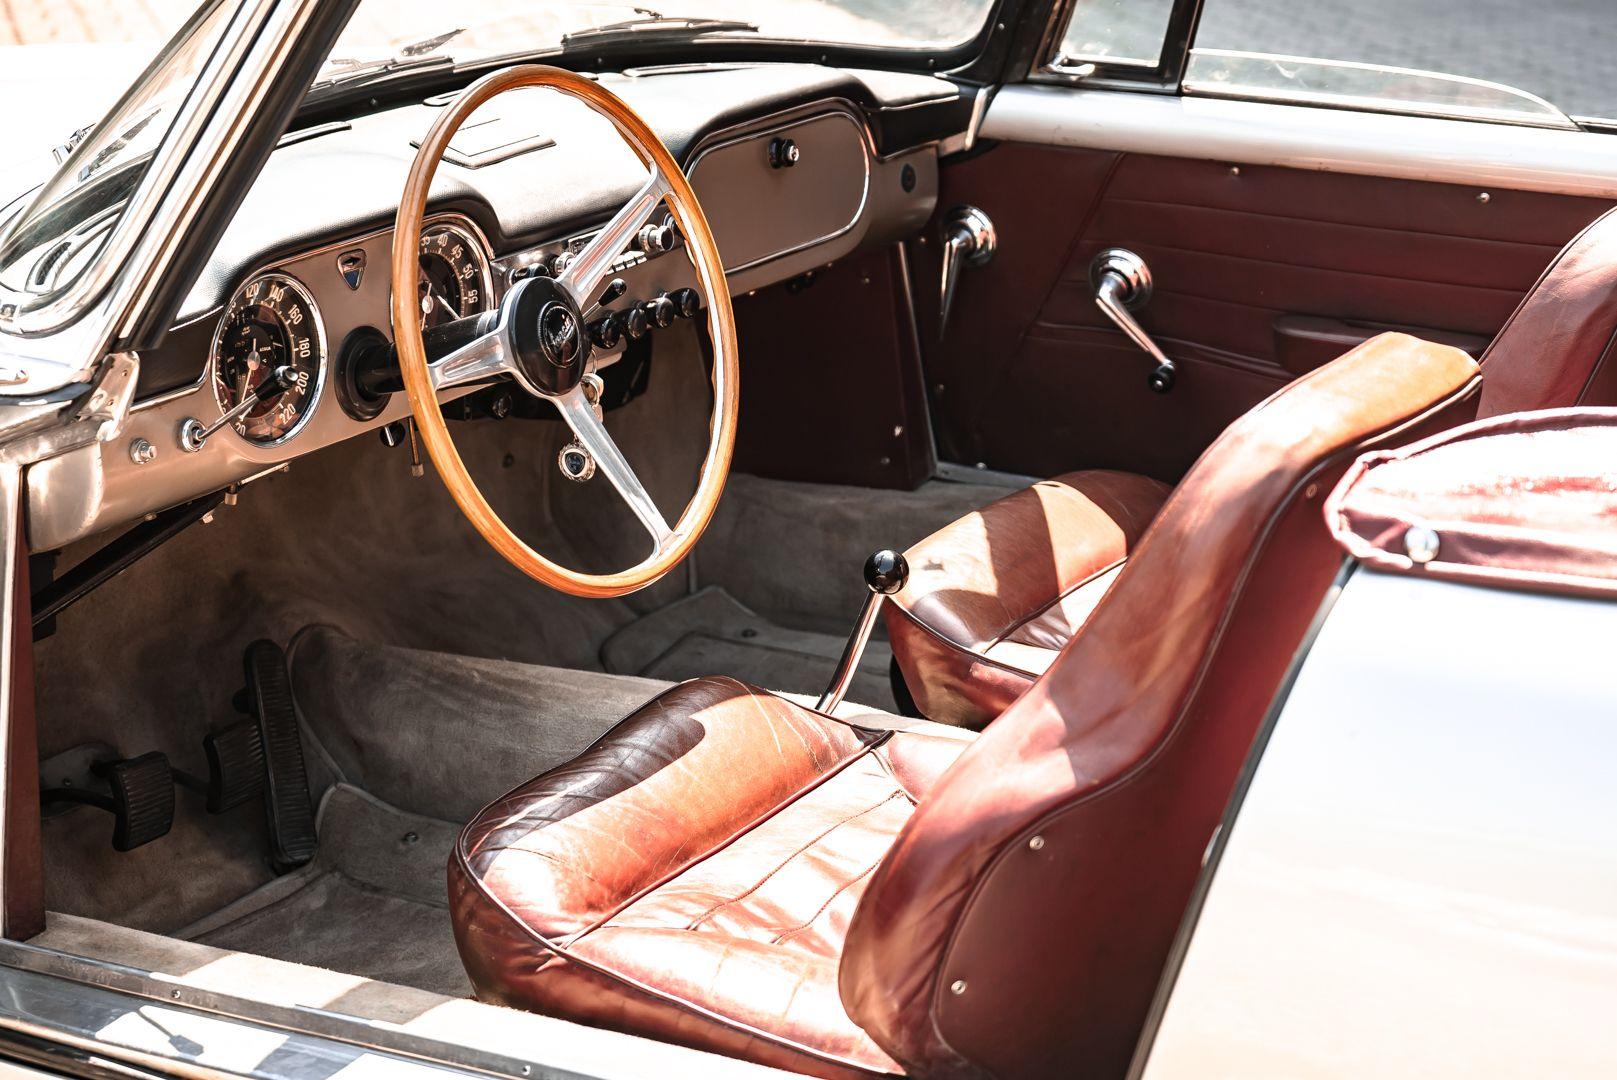 1963 Lancia Flaminia Touring Convertible 2500 3C  73159